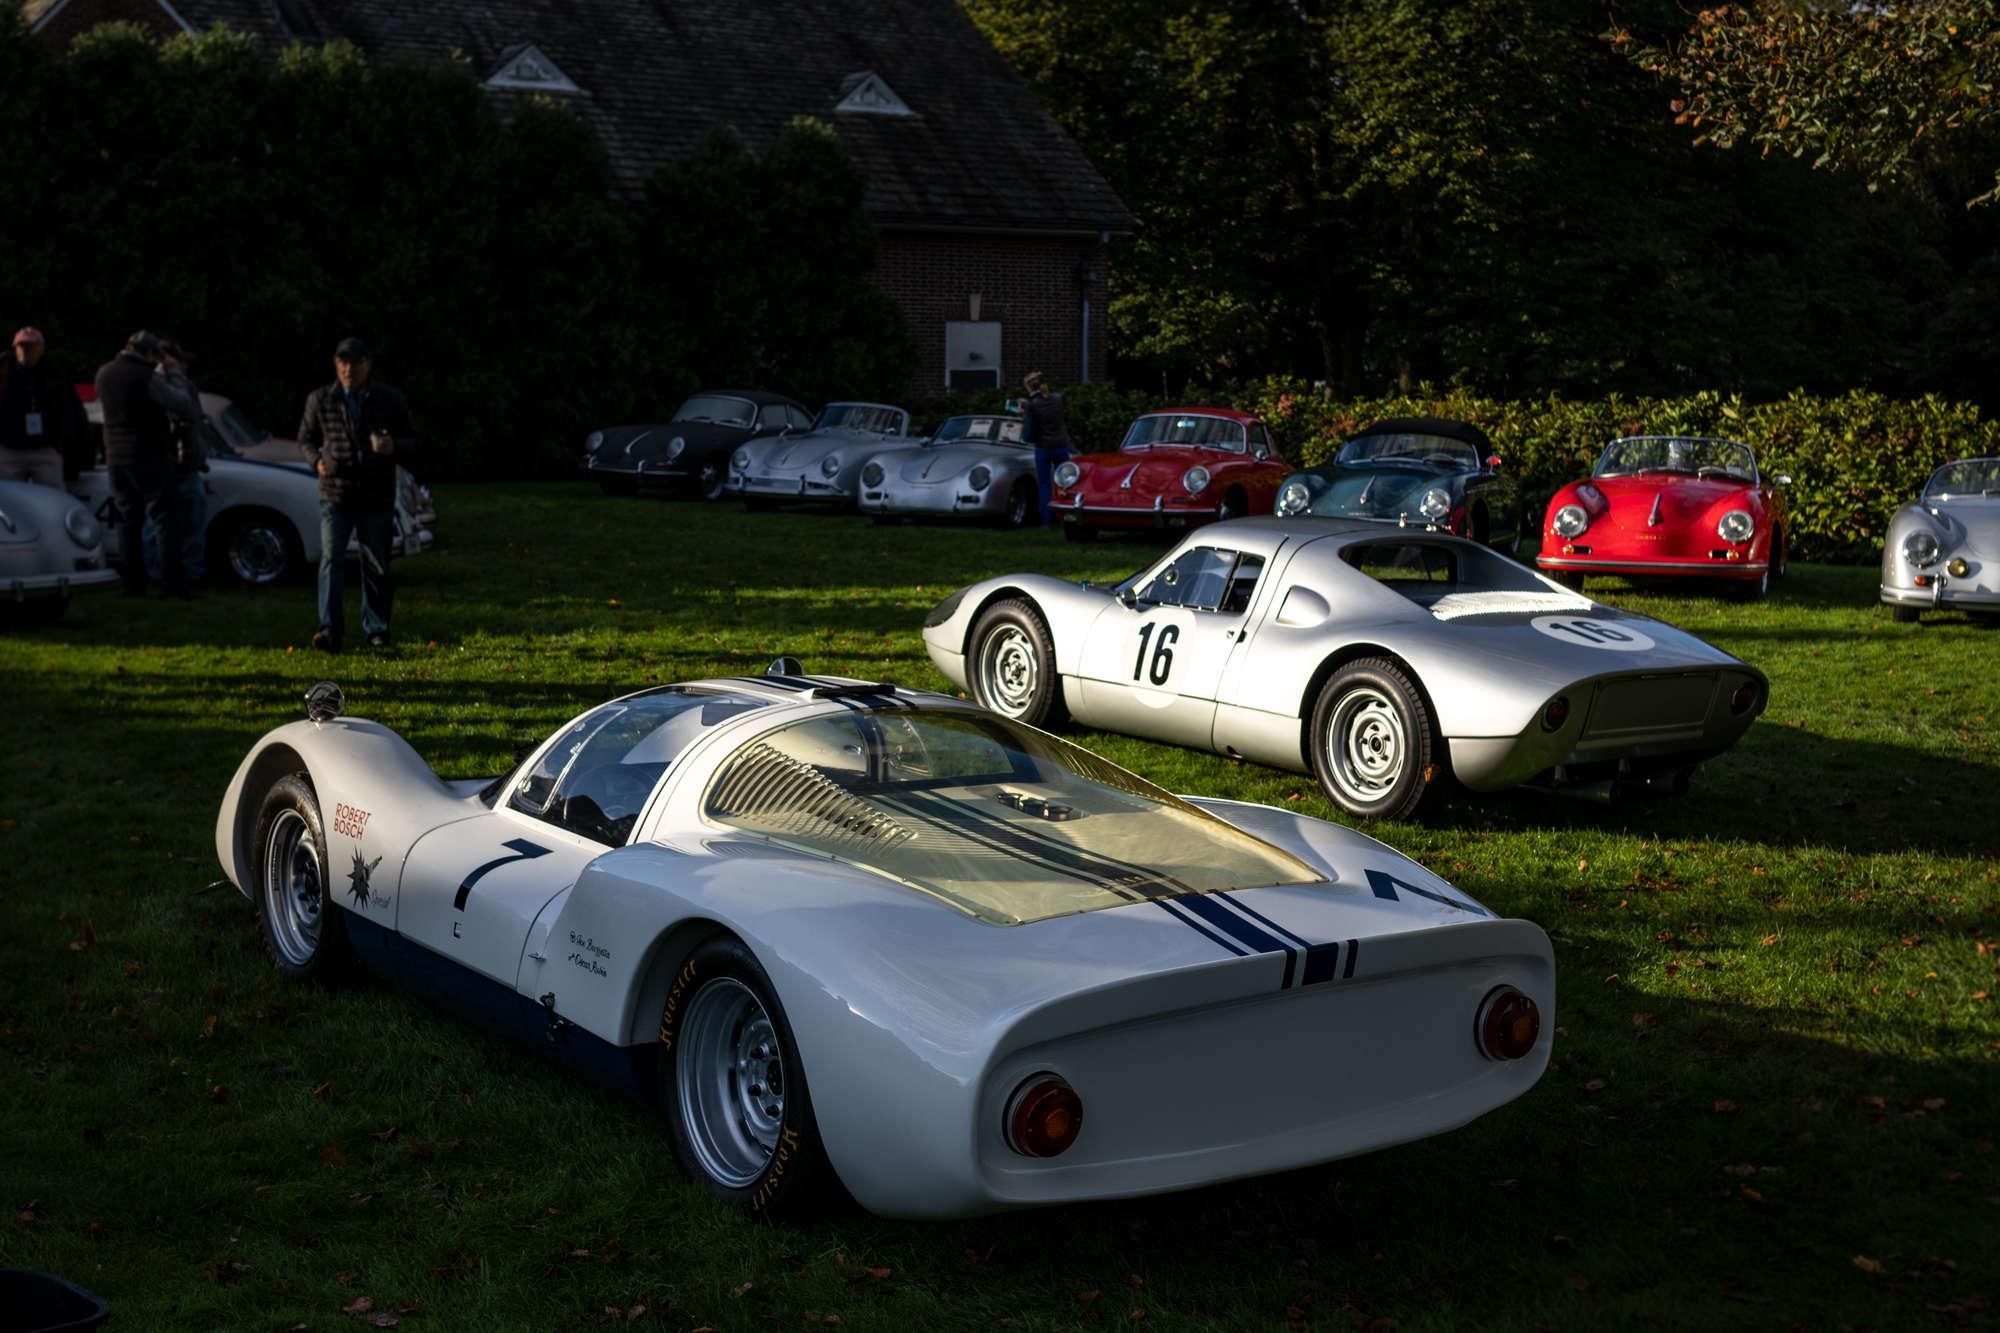 Porsche passion in Gatsby style